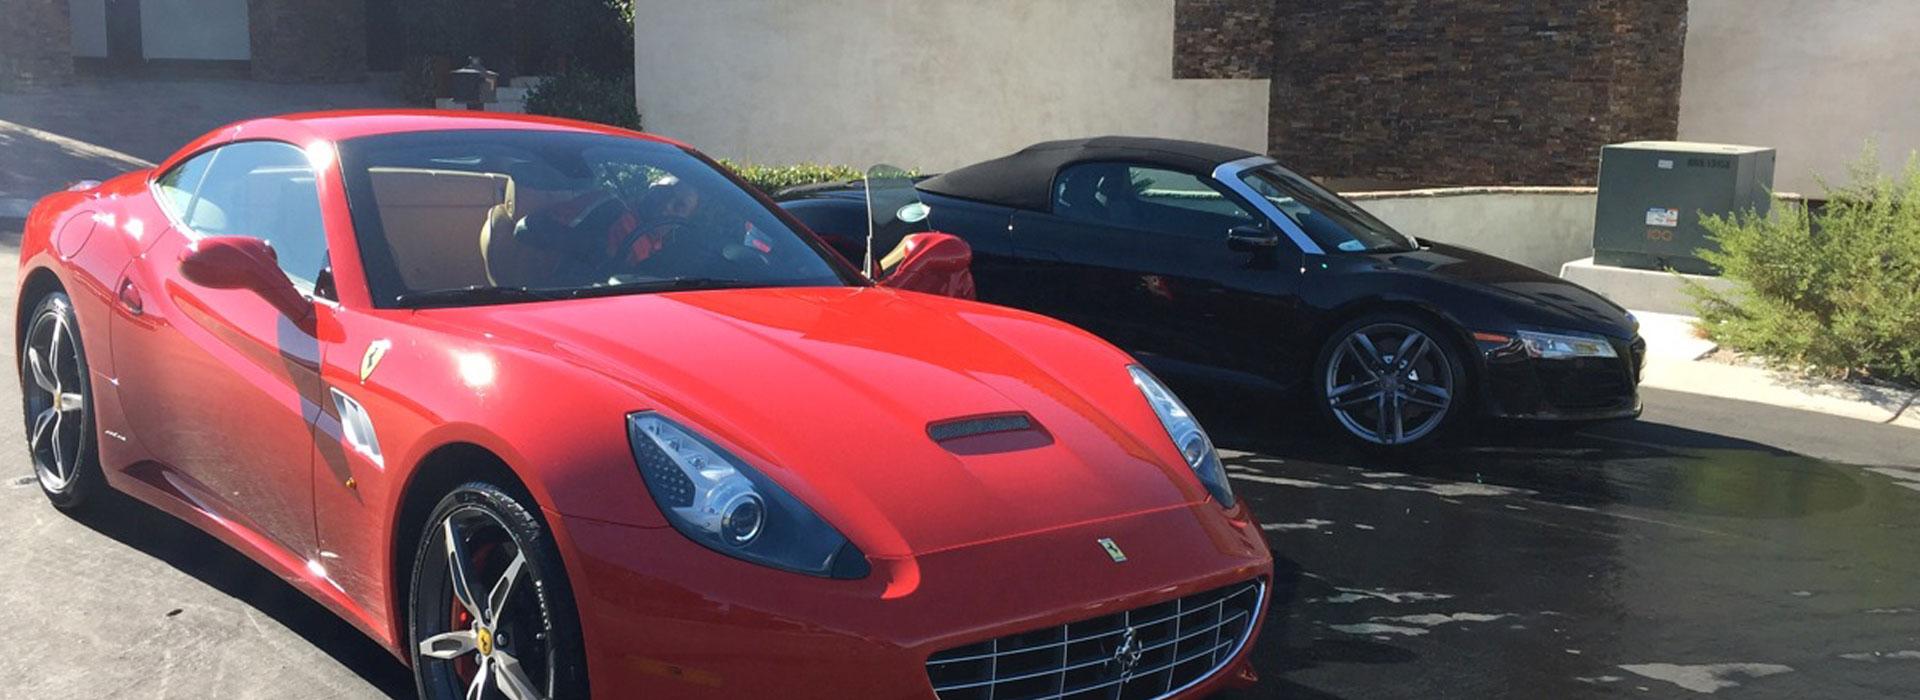 Professional Mobile Auto Detailing in Las Vegas, NV